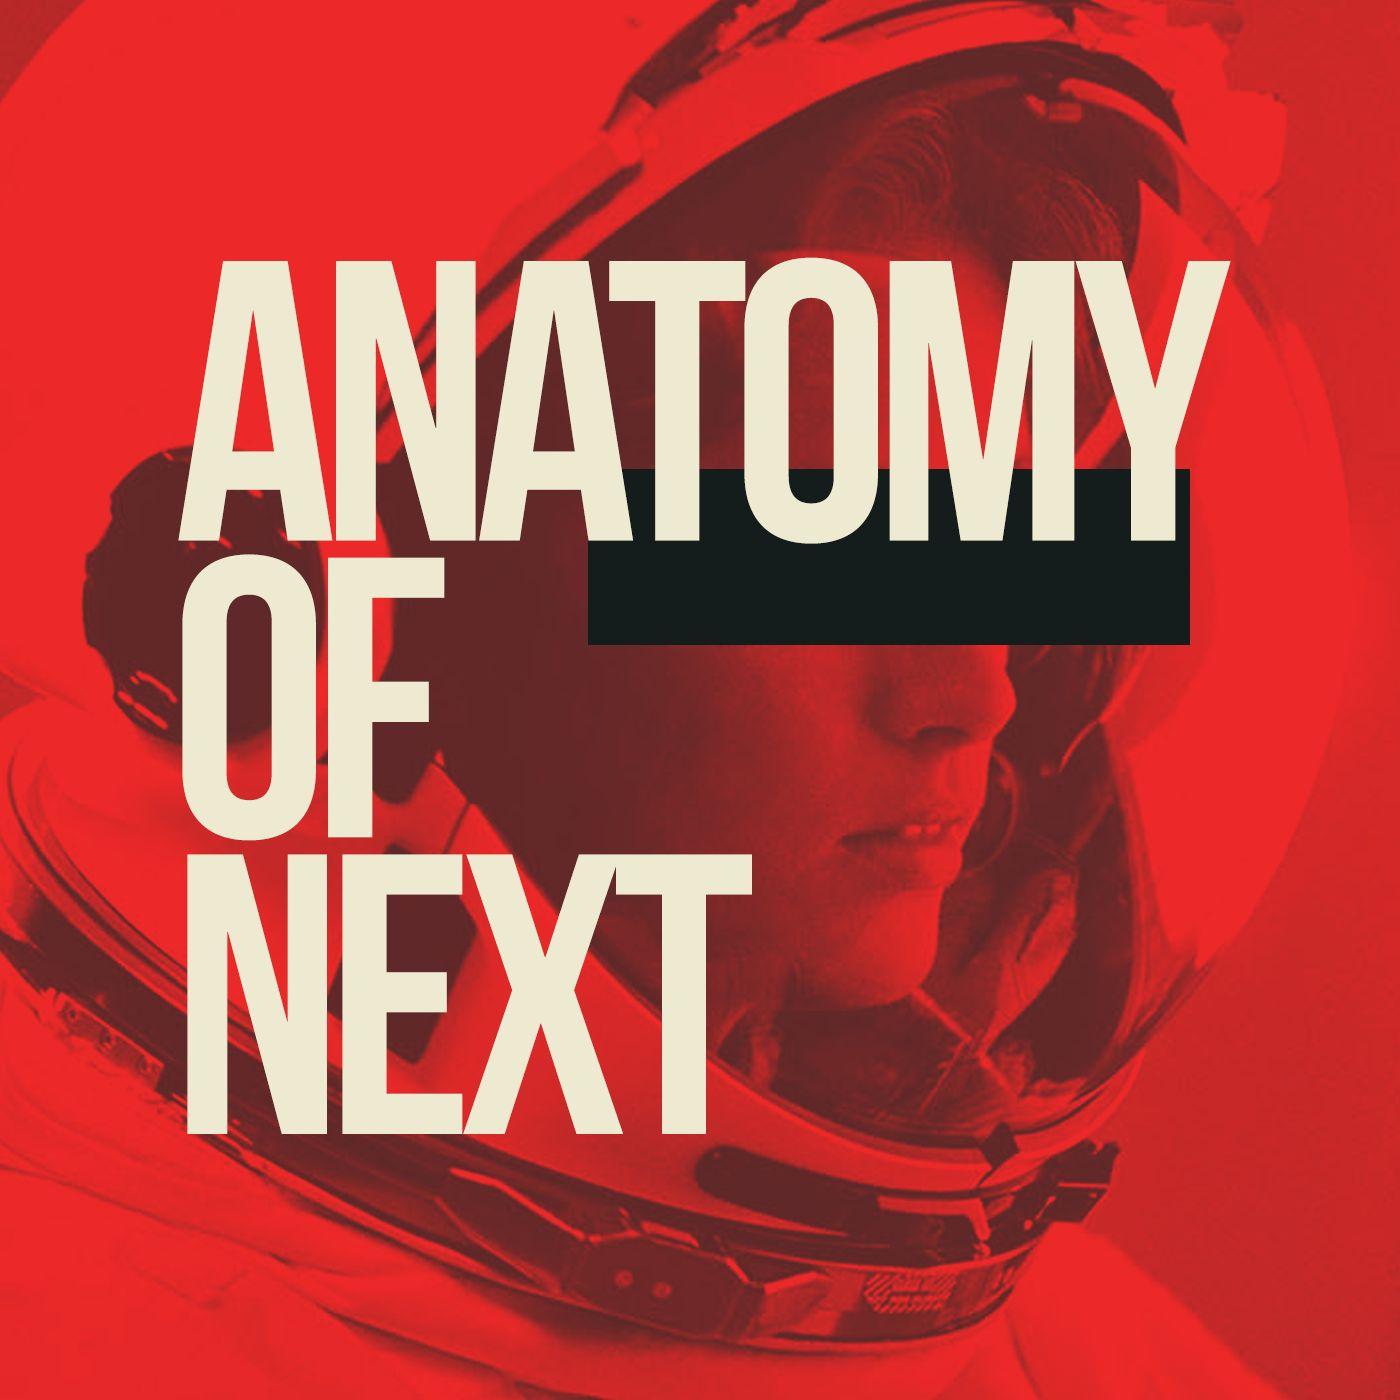 Anatomy of Next podcast